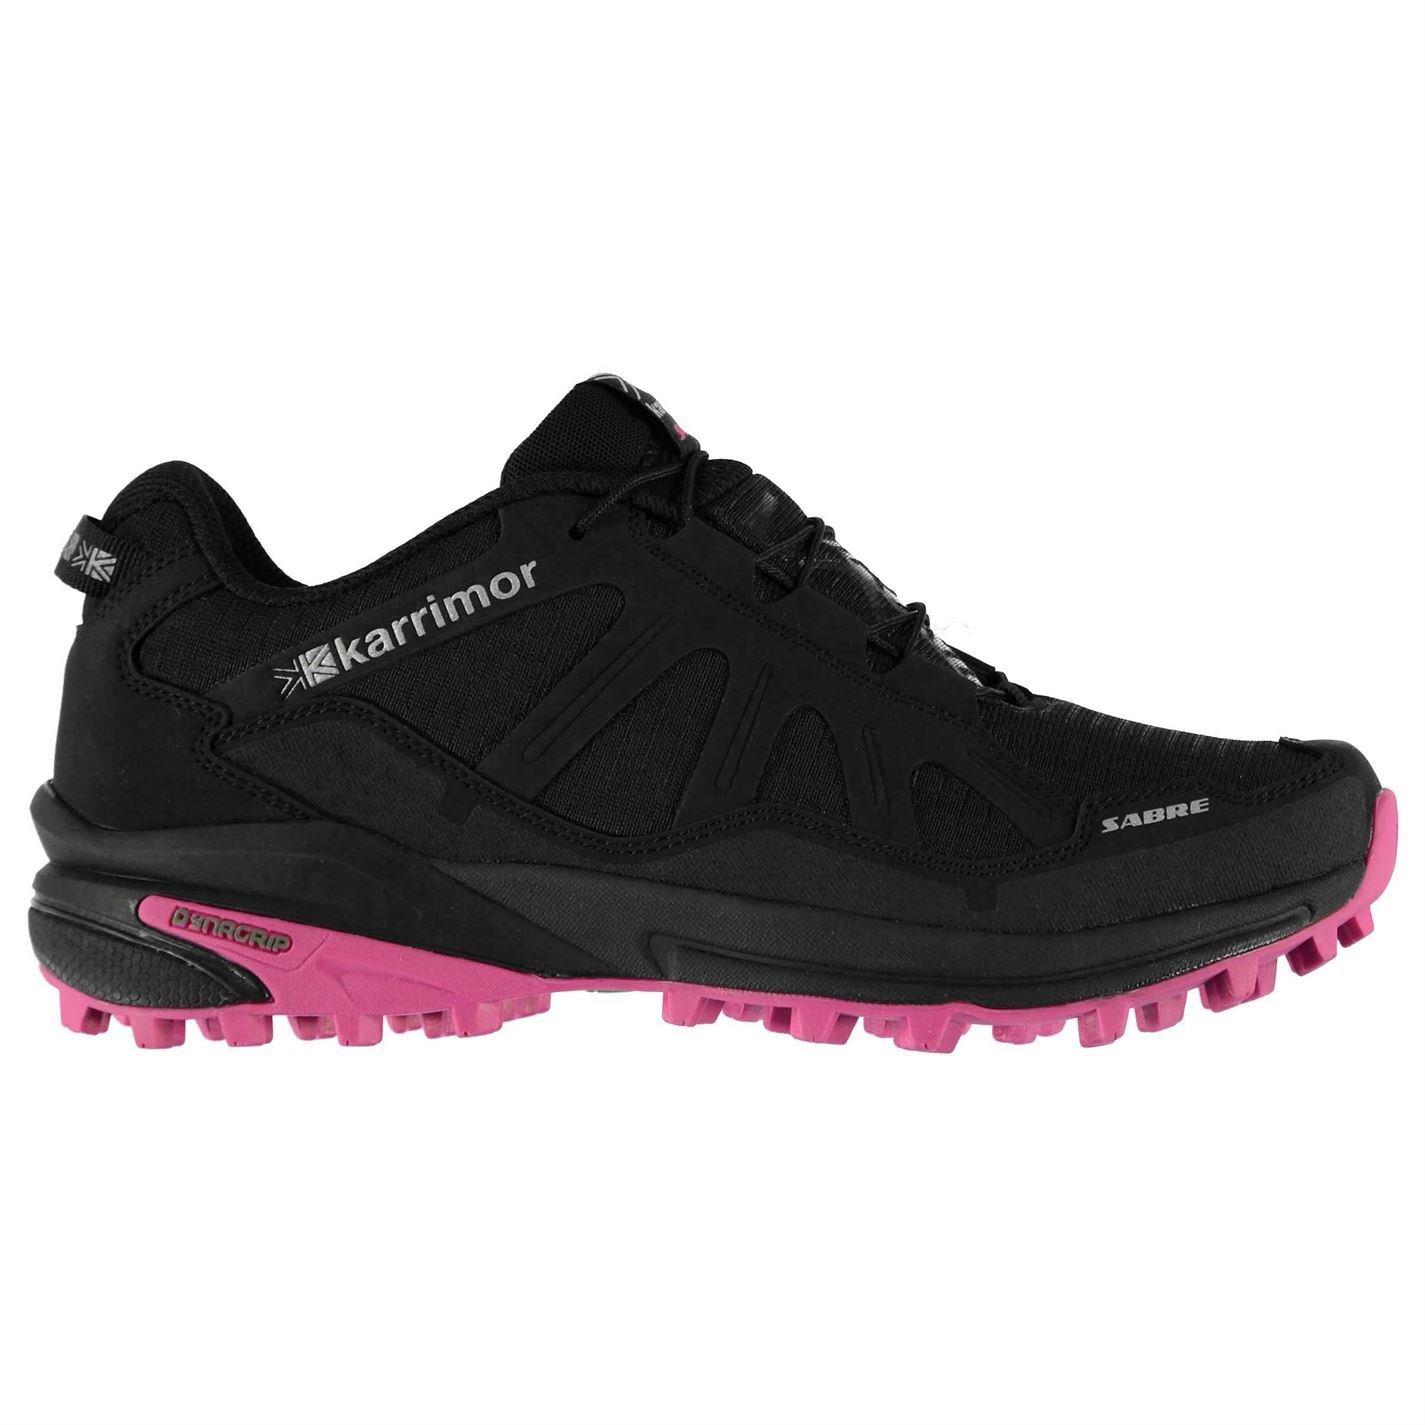 Karrimor Damen Schwarz/Pink Sabre Trail Laufschuhe Schwarz/Pink Damen c3140a